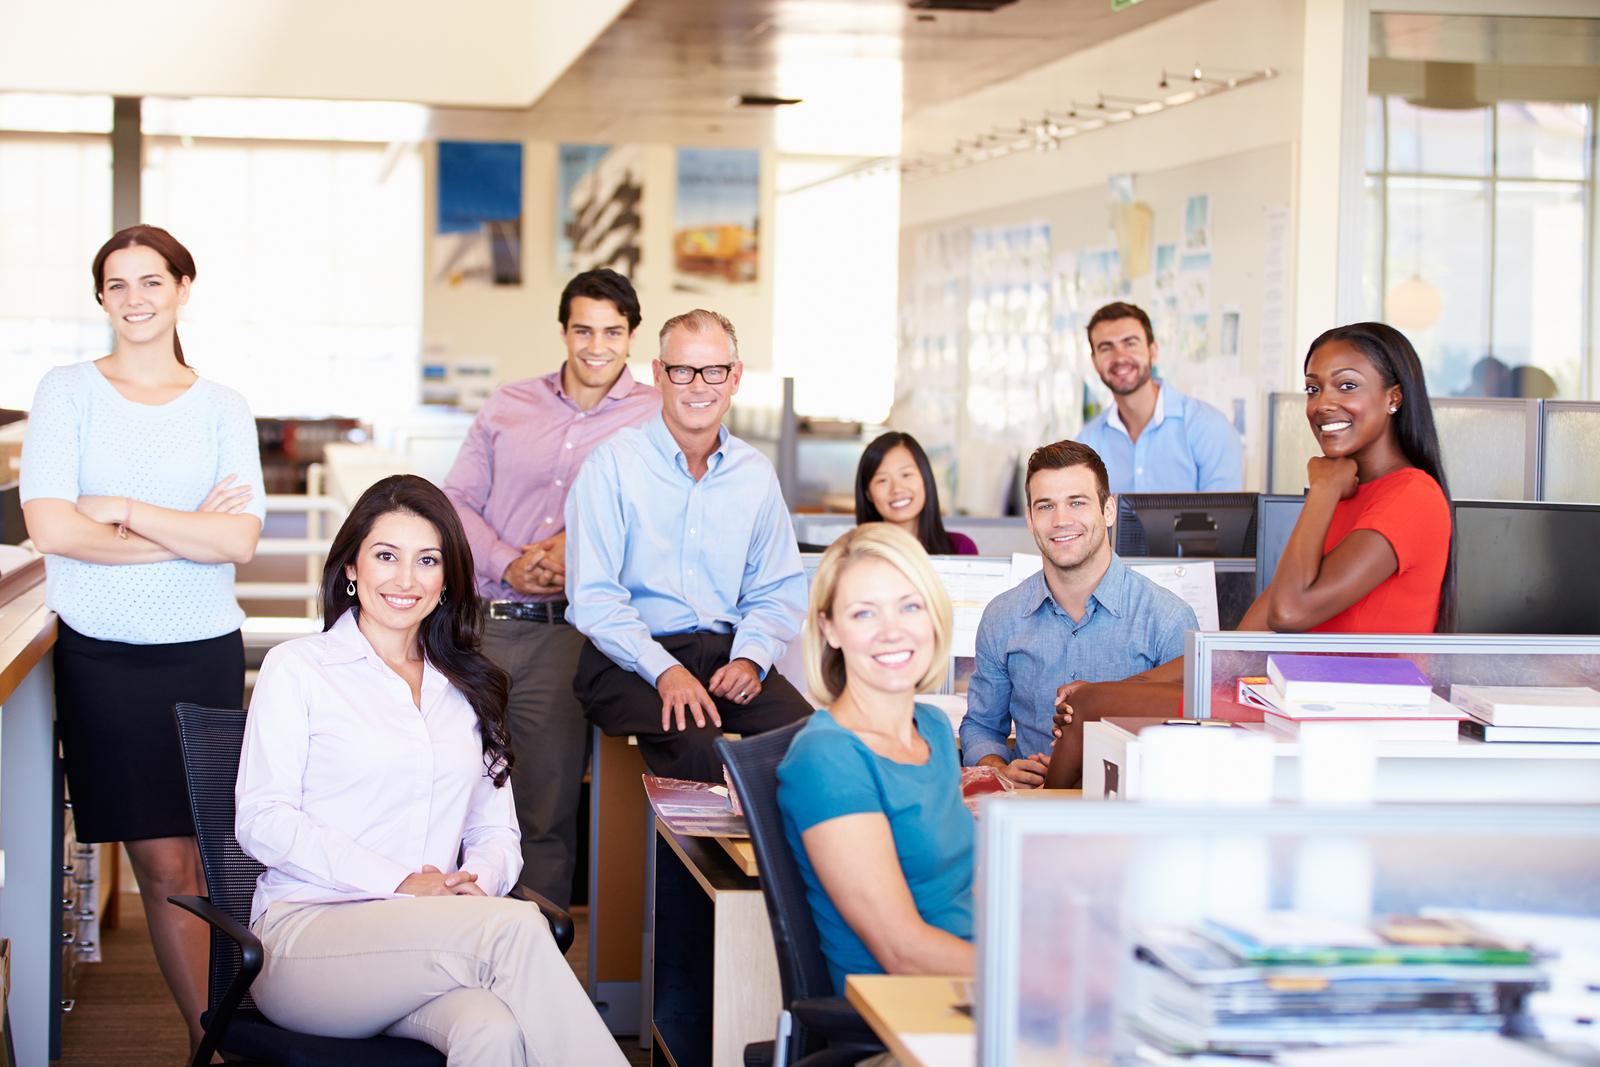 bigstock-Portrait-Of-Businesspeople-In-59300477